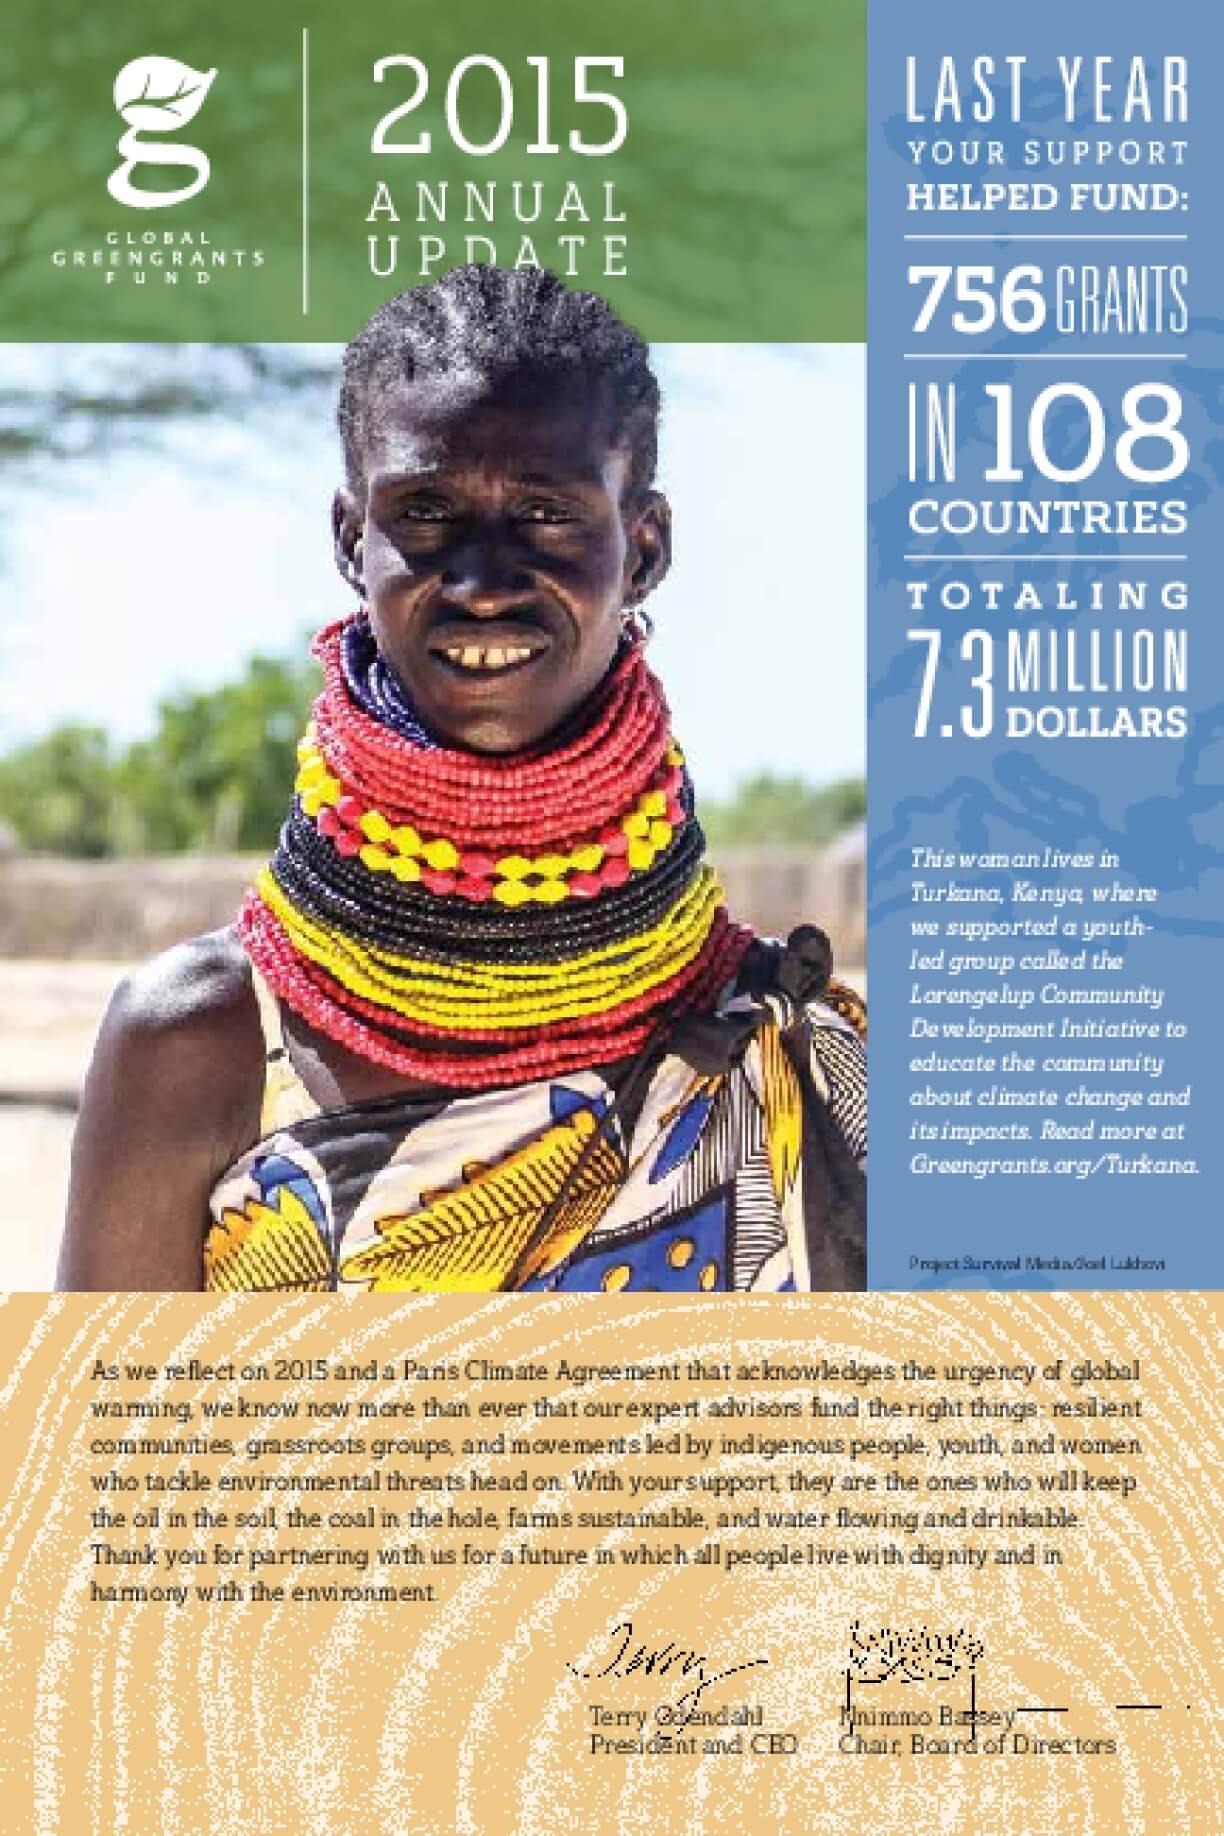 Global Greengrants Fund 2015 Annual Update